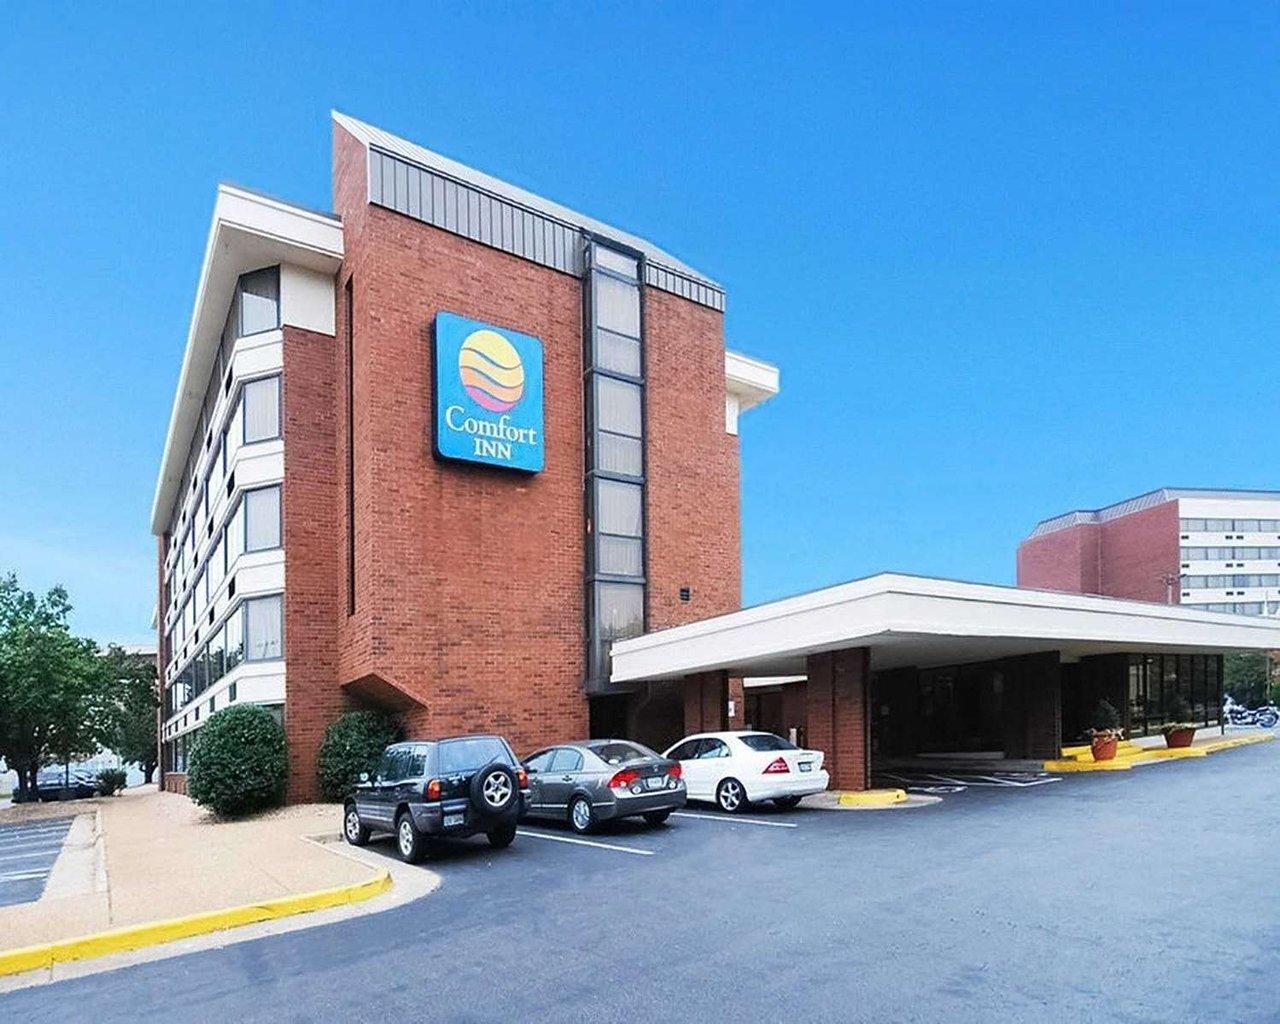 THE 10 CLOSEST Hotels to Franconia-Springfield Station - TripAdvisor